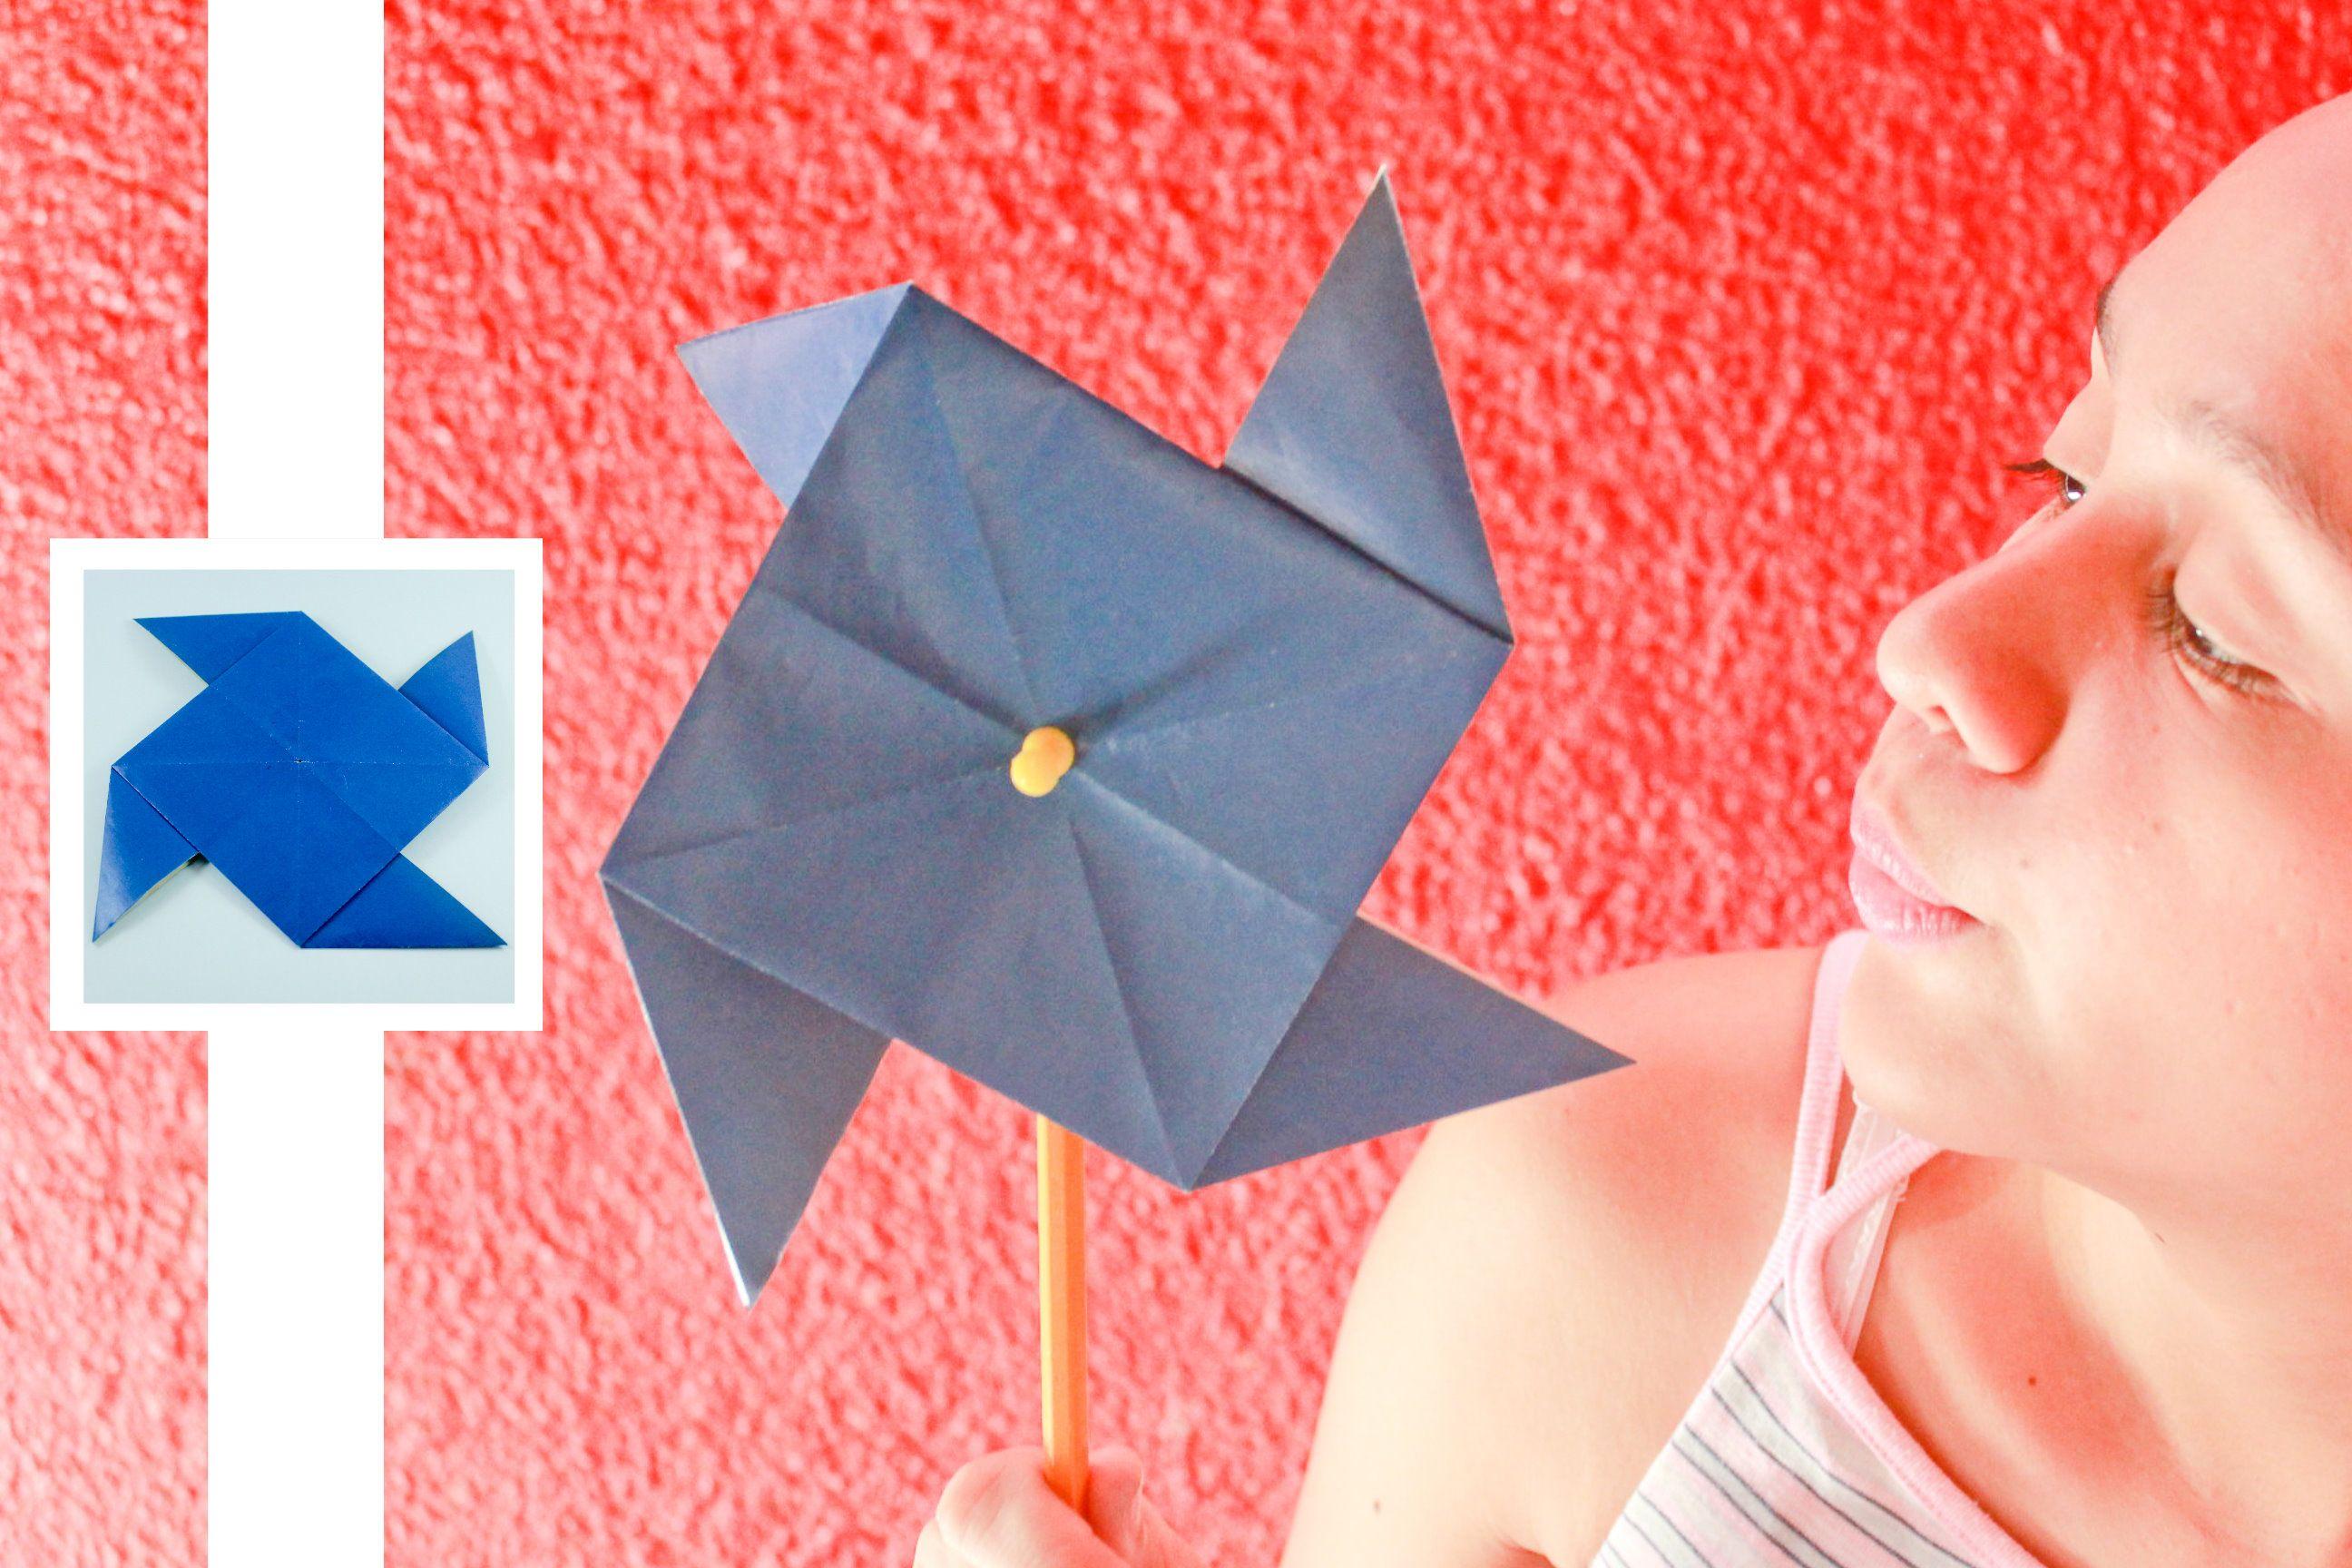 pinwheel how to make instructions